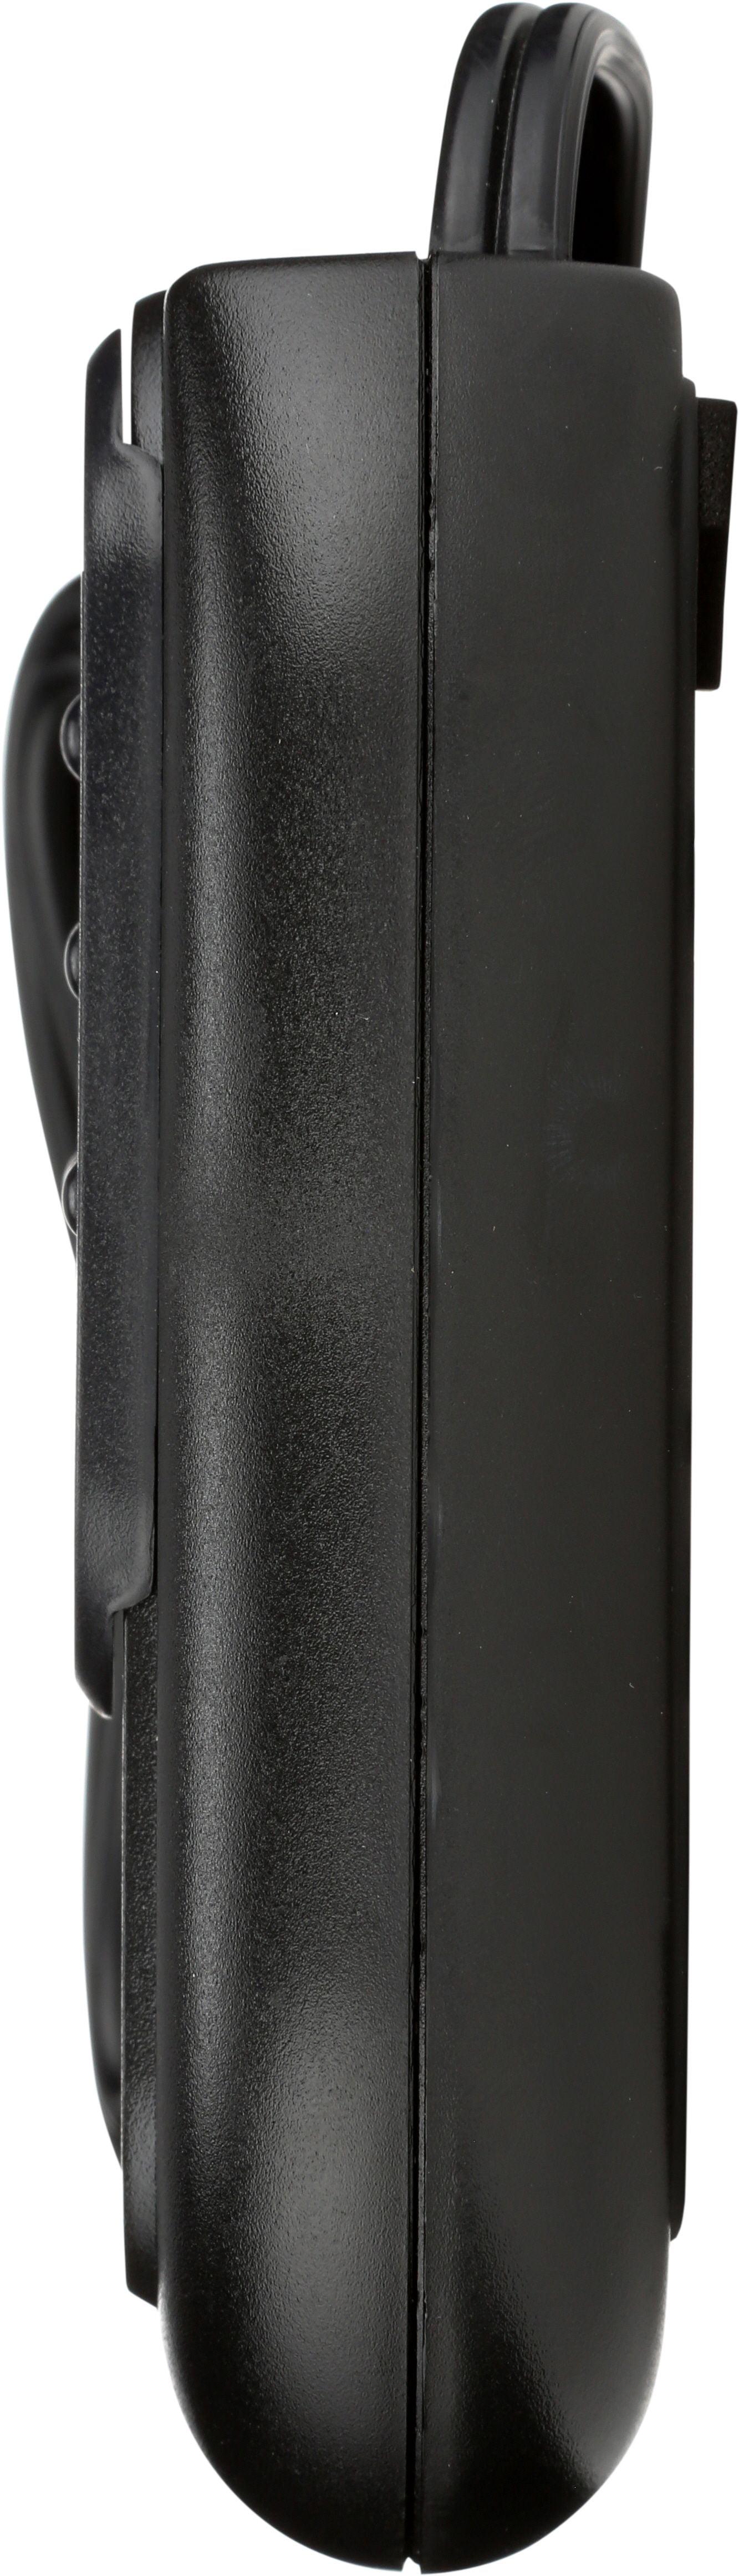 AmerTac 6089B Westek 500W Full Range Foot Control Dimmer